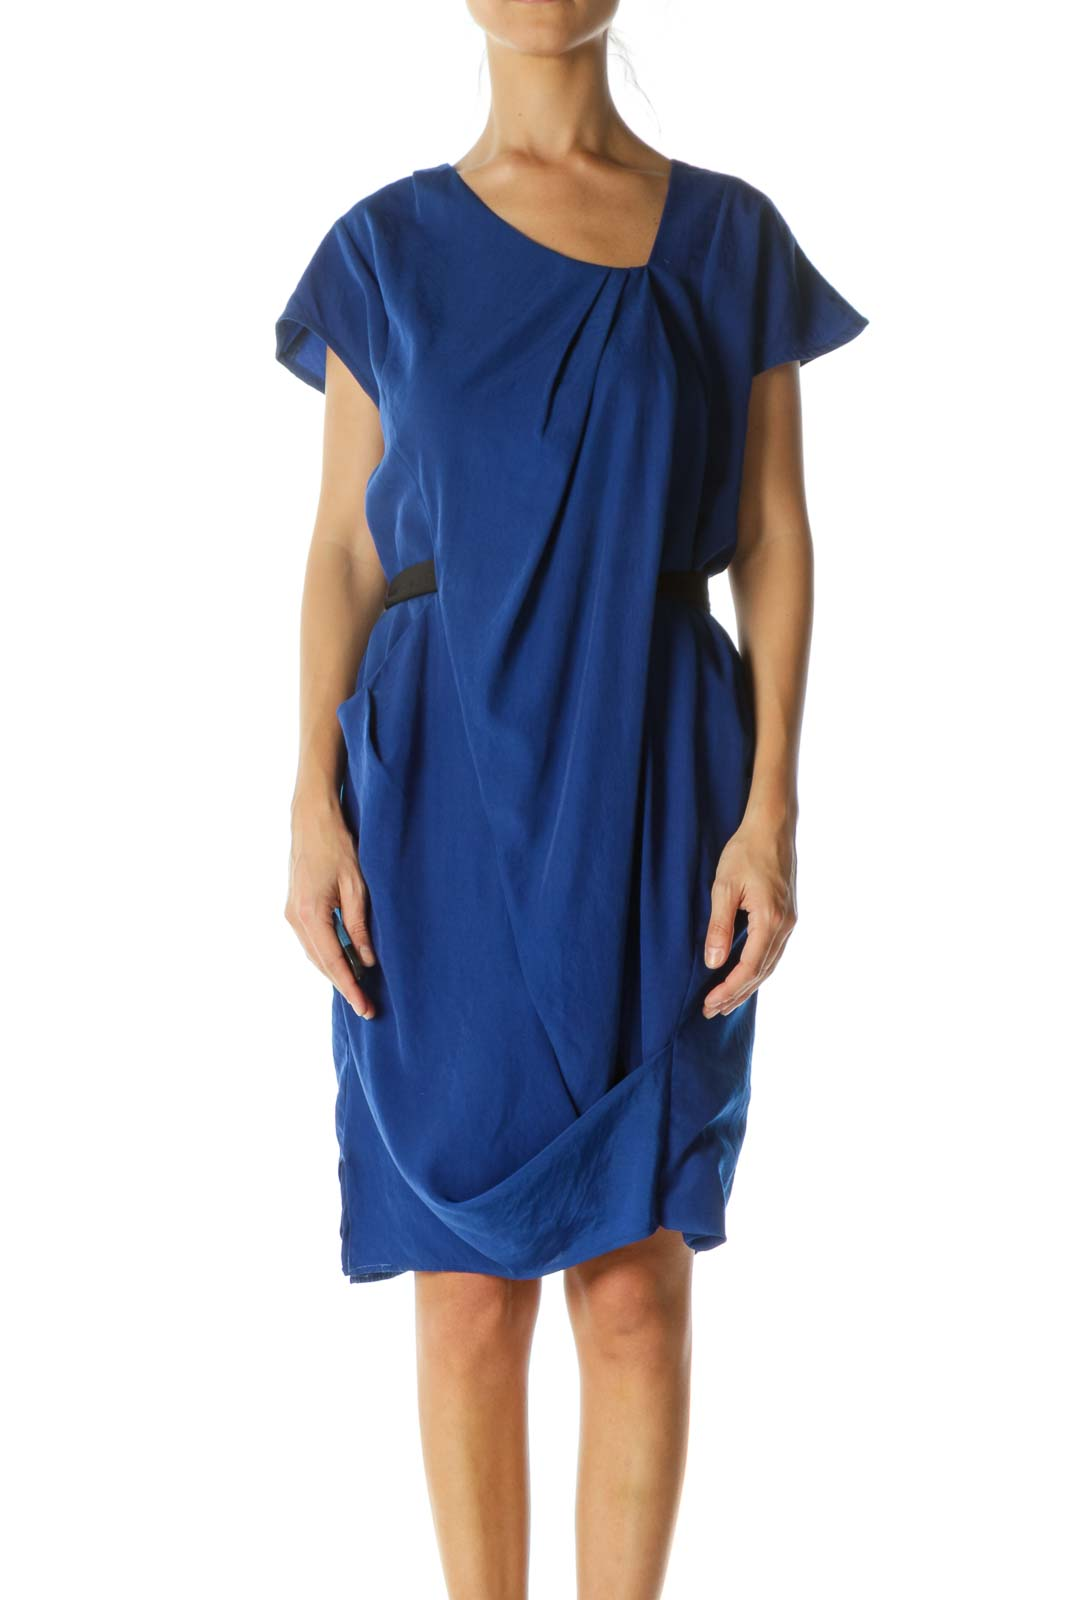 Blue Asymmetric Waist Tie Day Dress Front